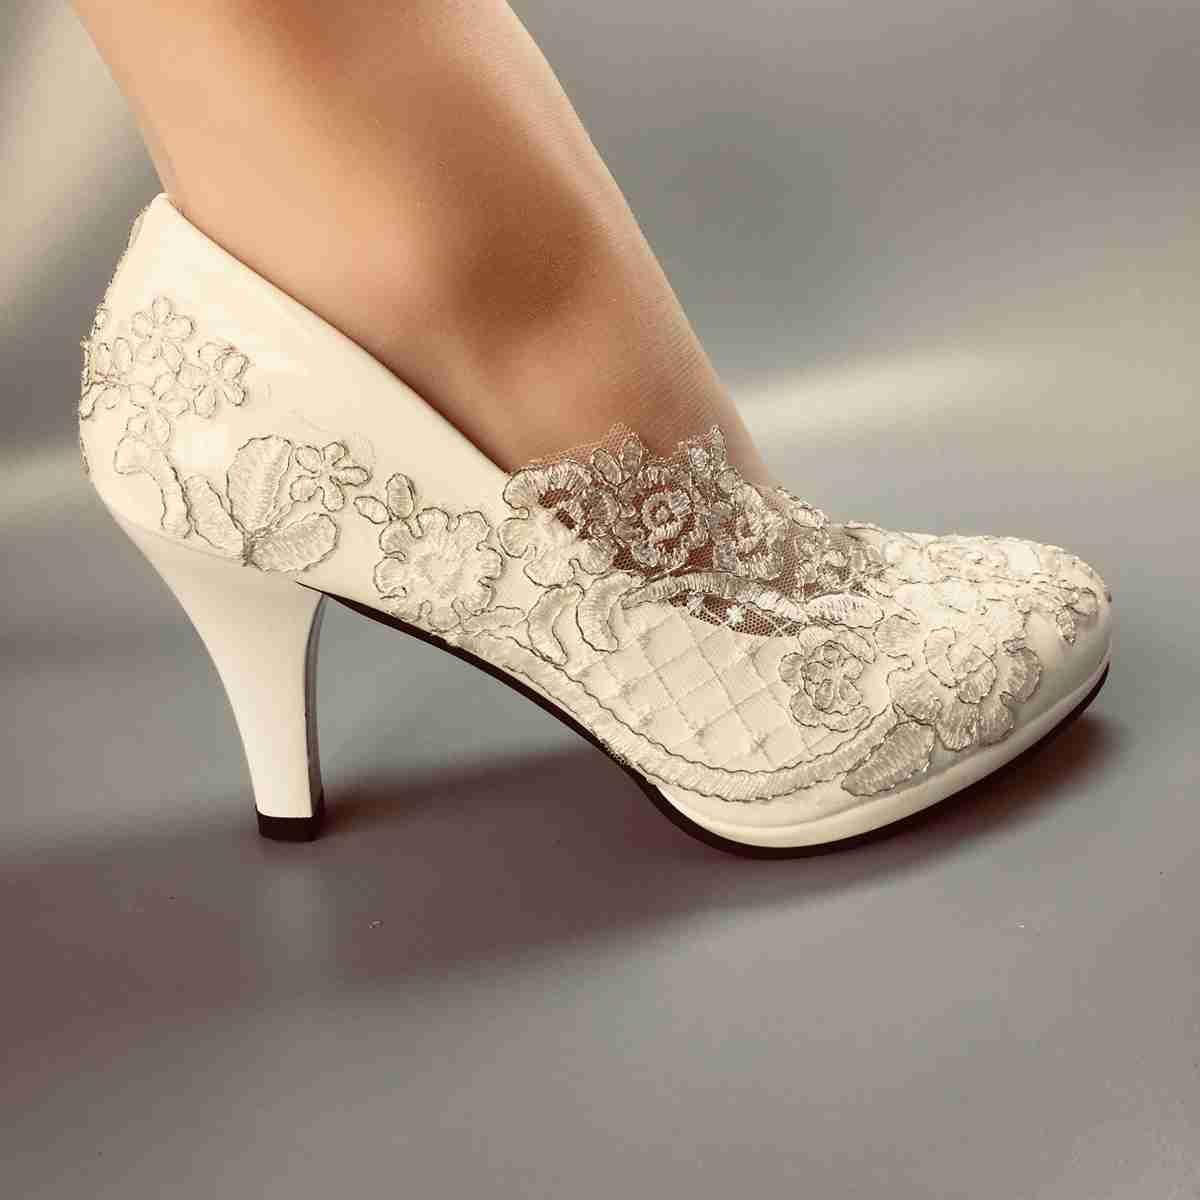 Women Wedding Shoes Waterproof White Lace Bride Wedding Dresses HEEL  Diamond Lace Manual Wedding BRIDAL HEEL Shoes SIZE EU 35 42 Wedding Shoes  Purple